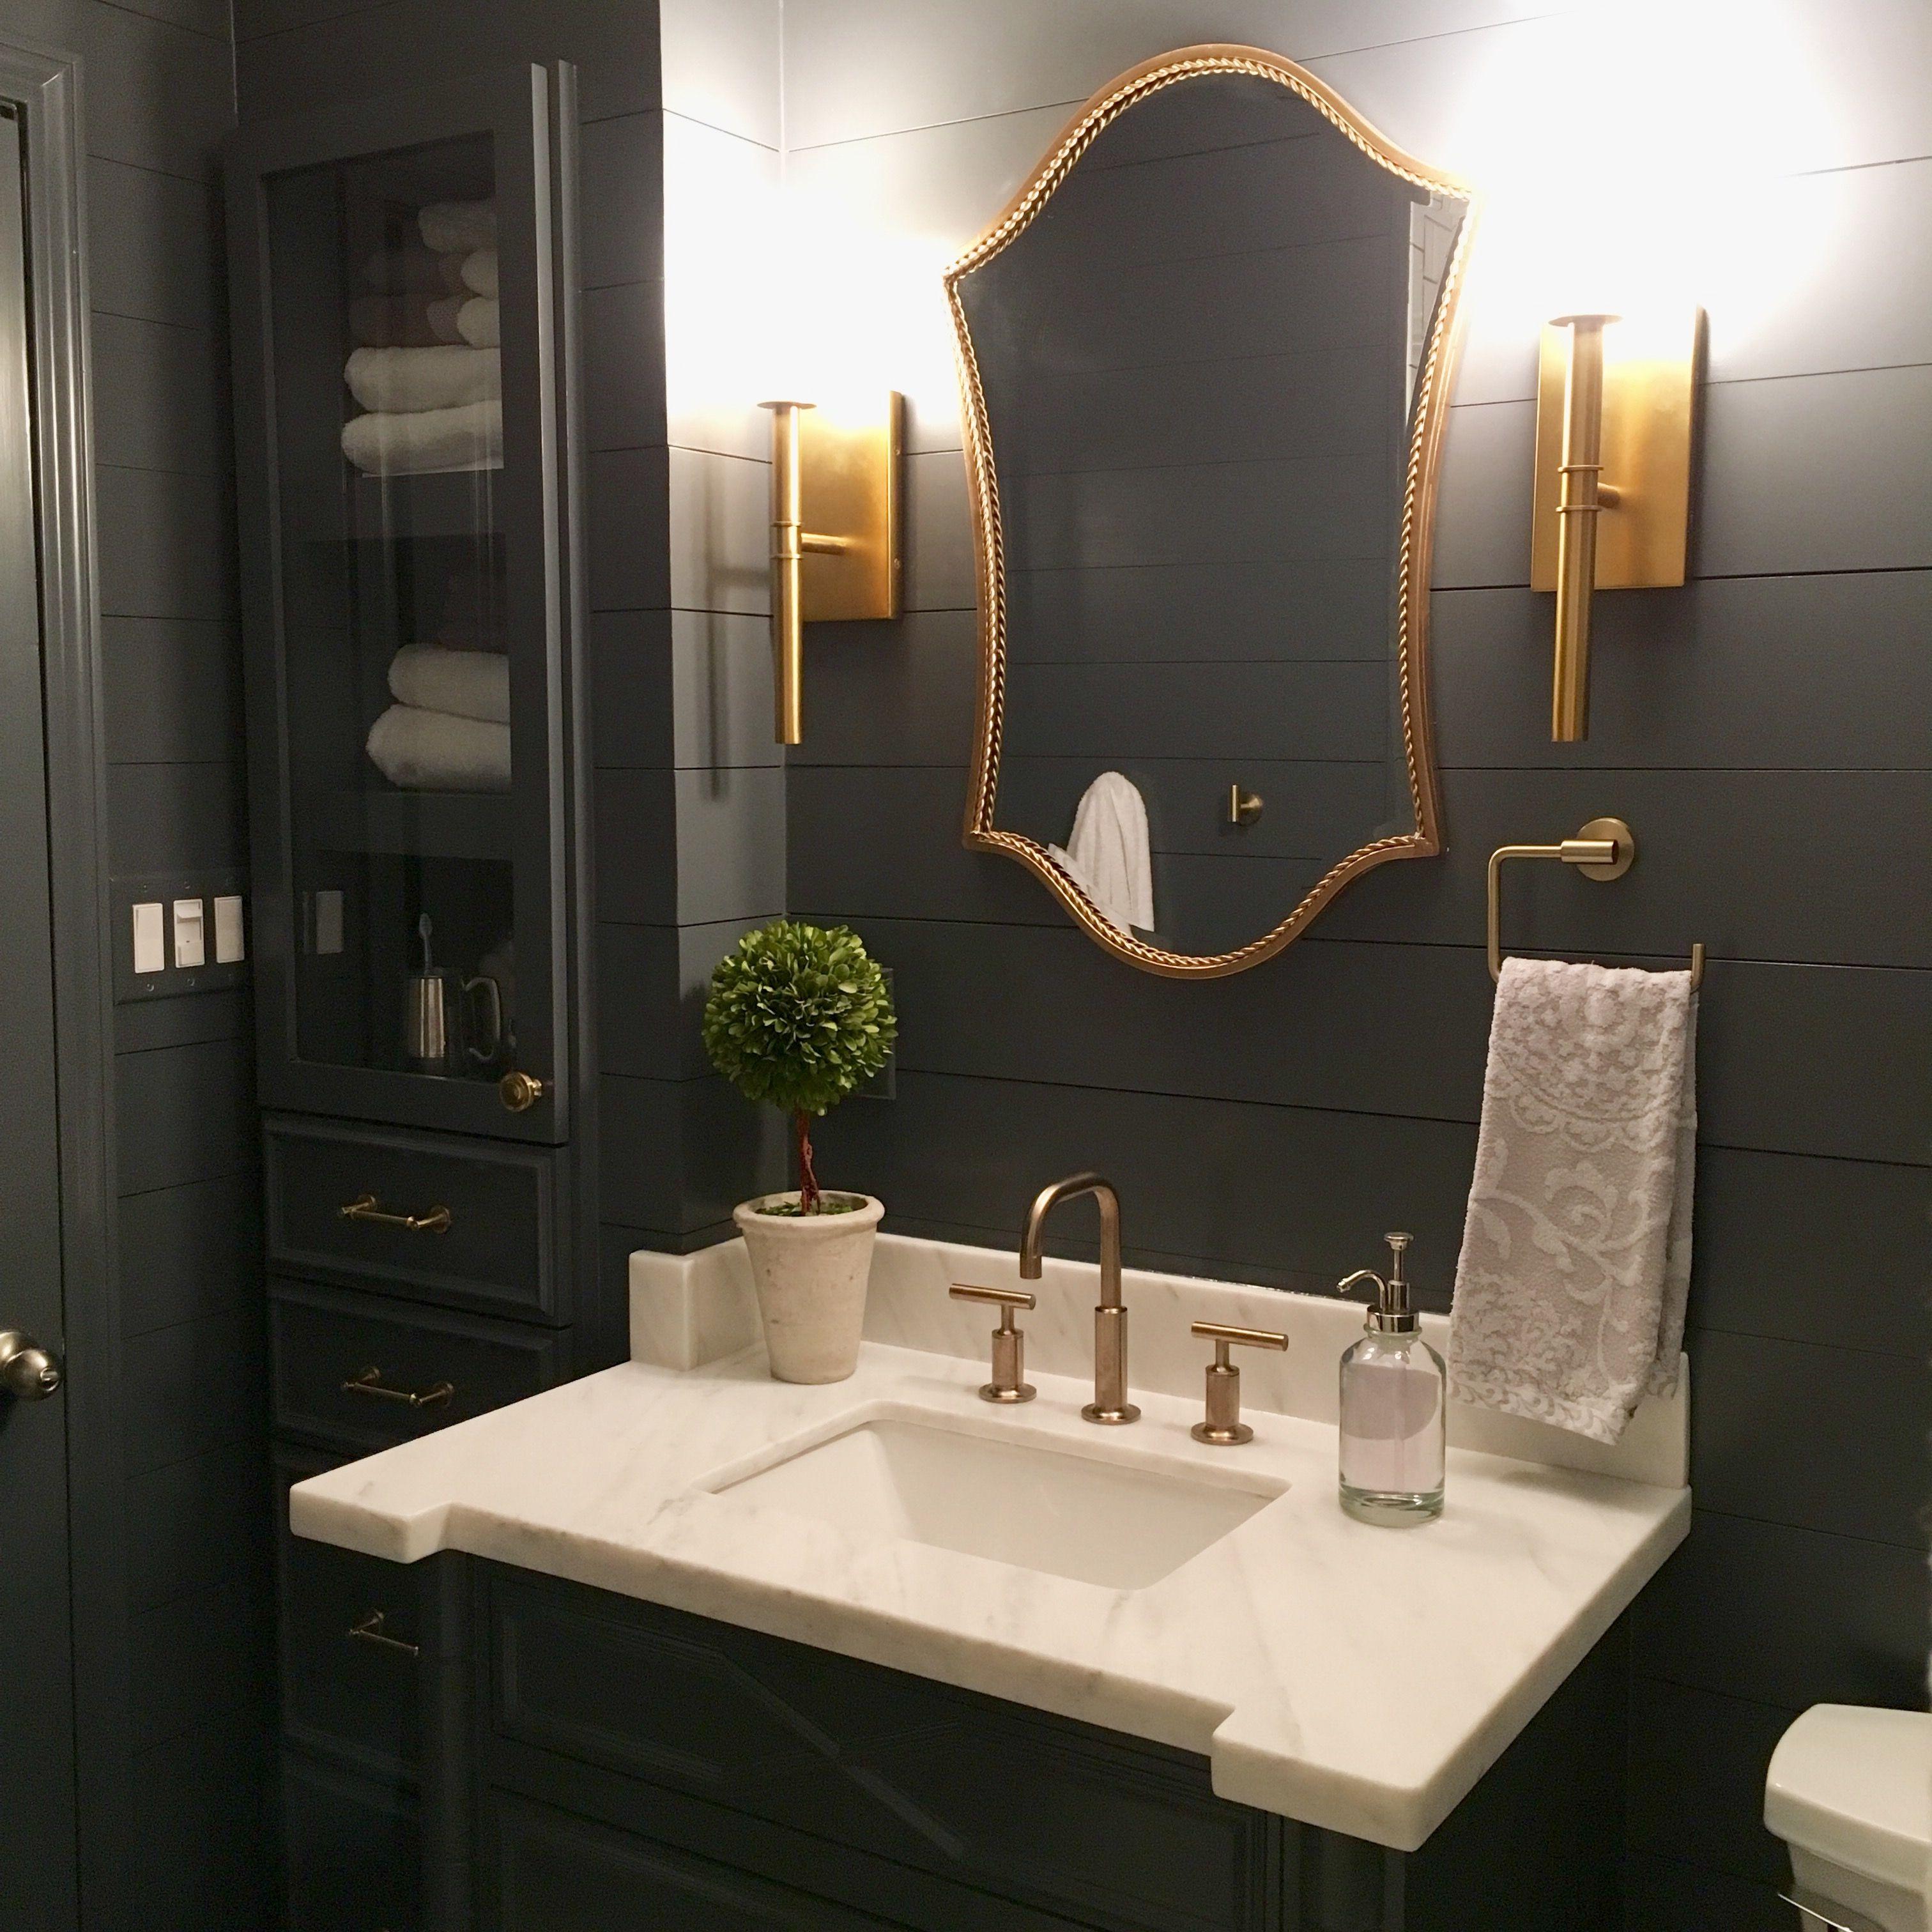 Amy Zee Haight Design Interiors Interior Design Design Home